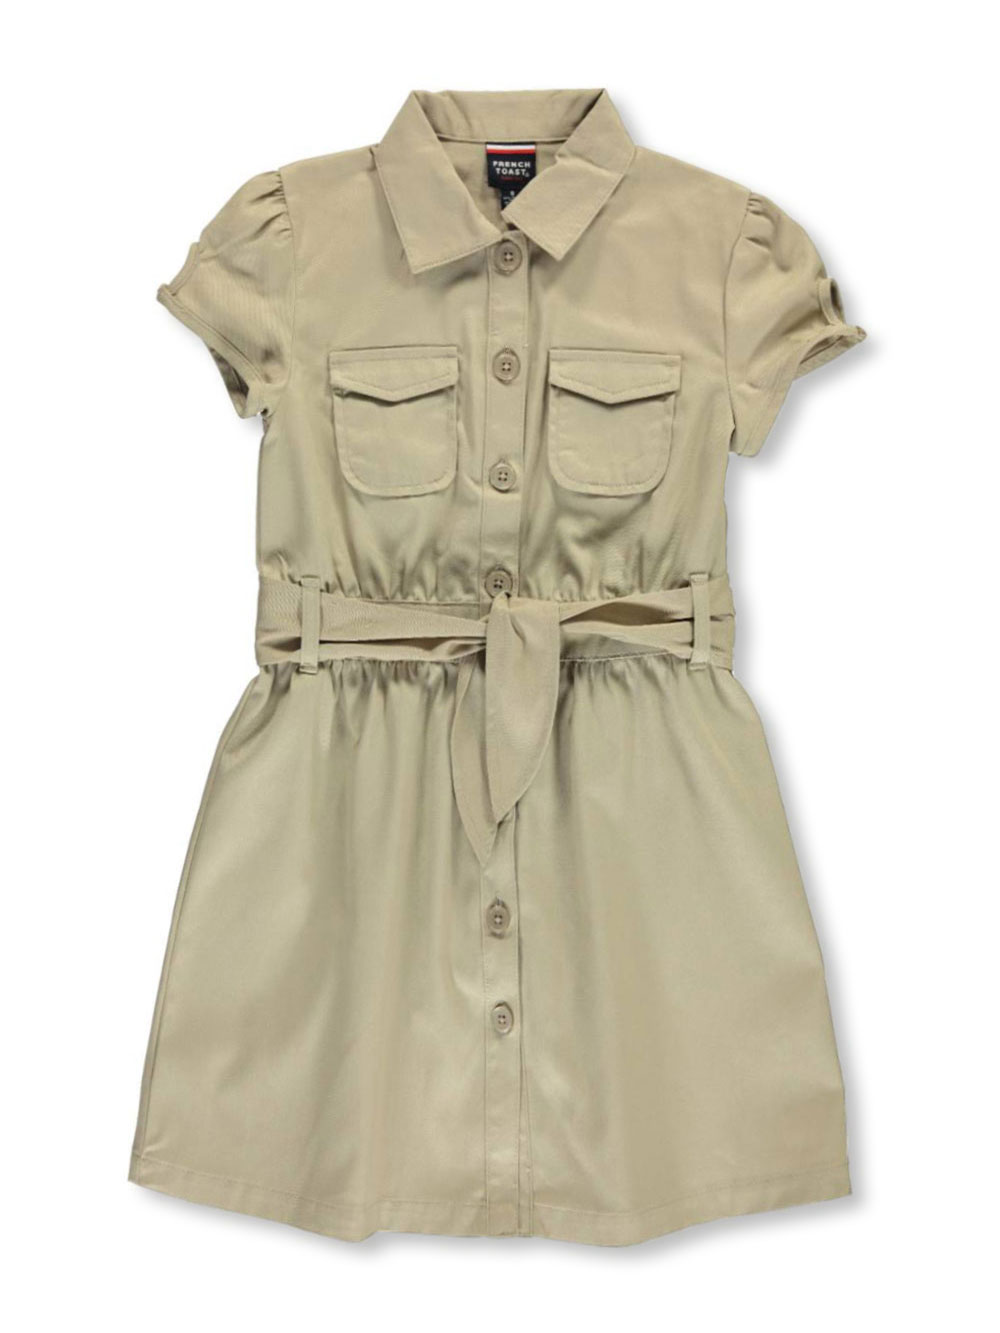 French Toast School Uniform Girls Cami Top Tank